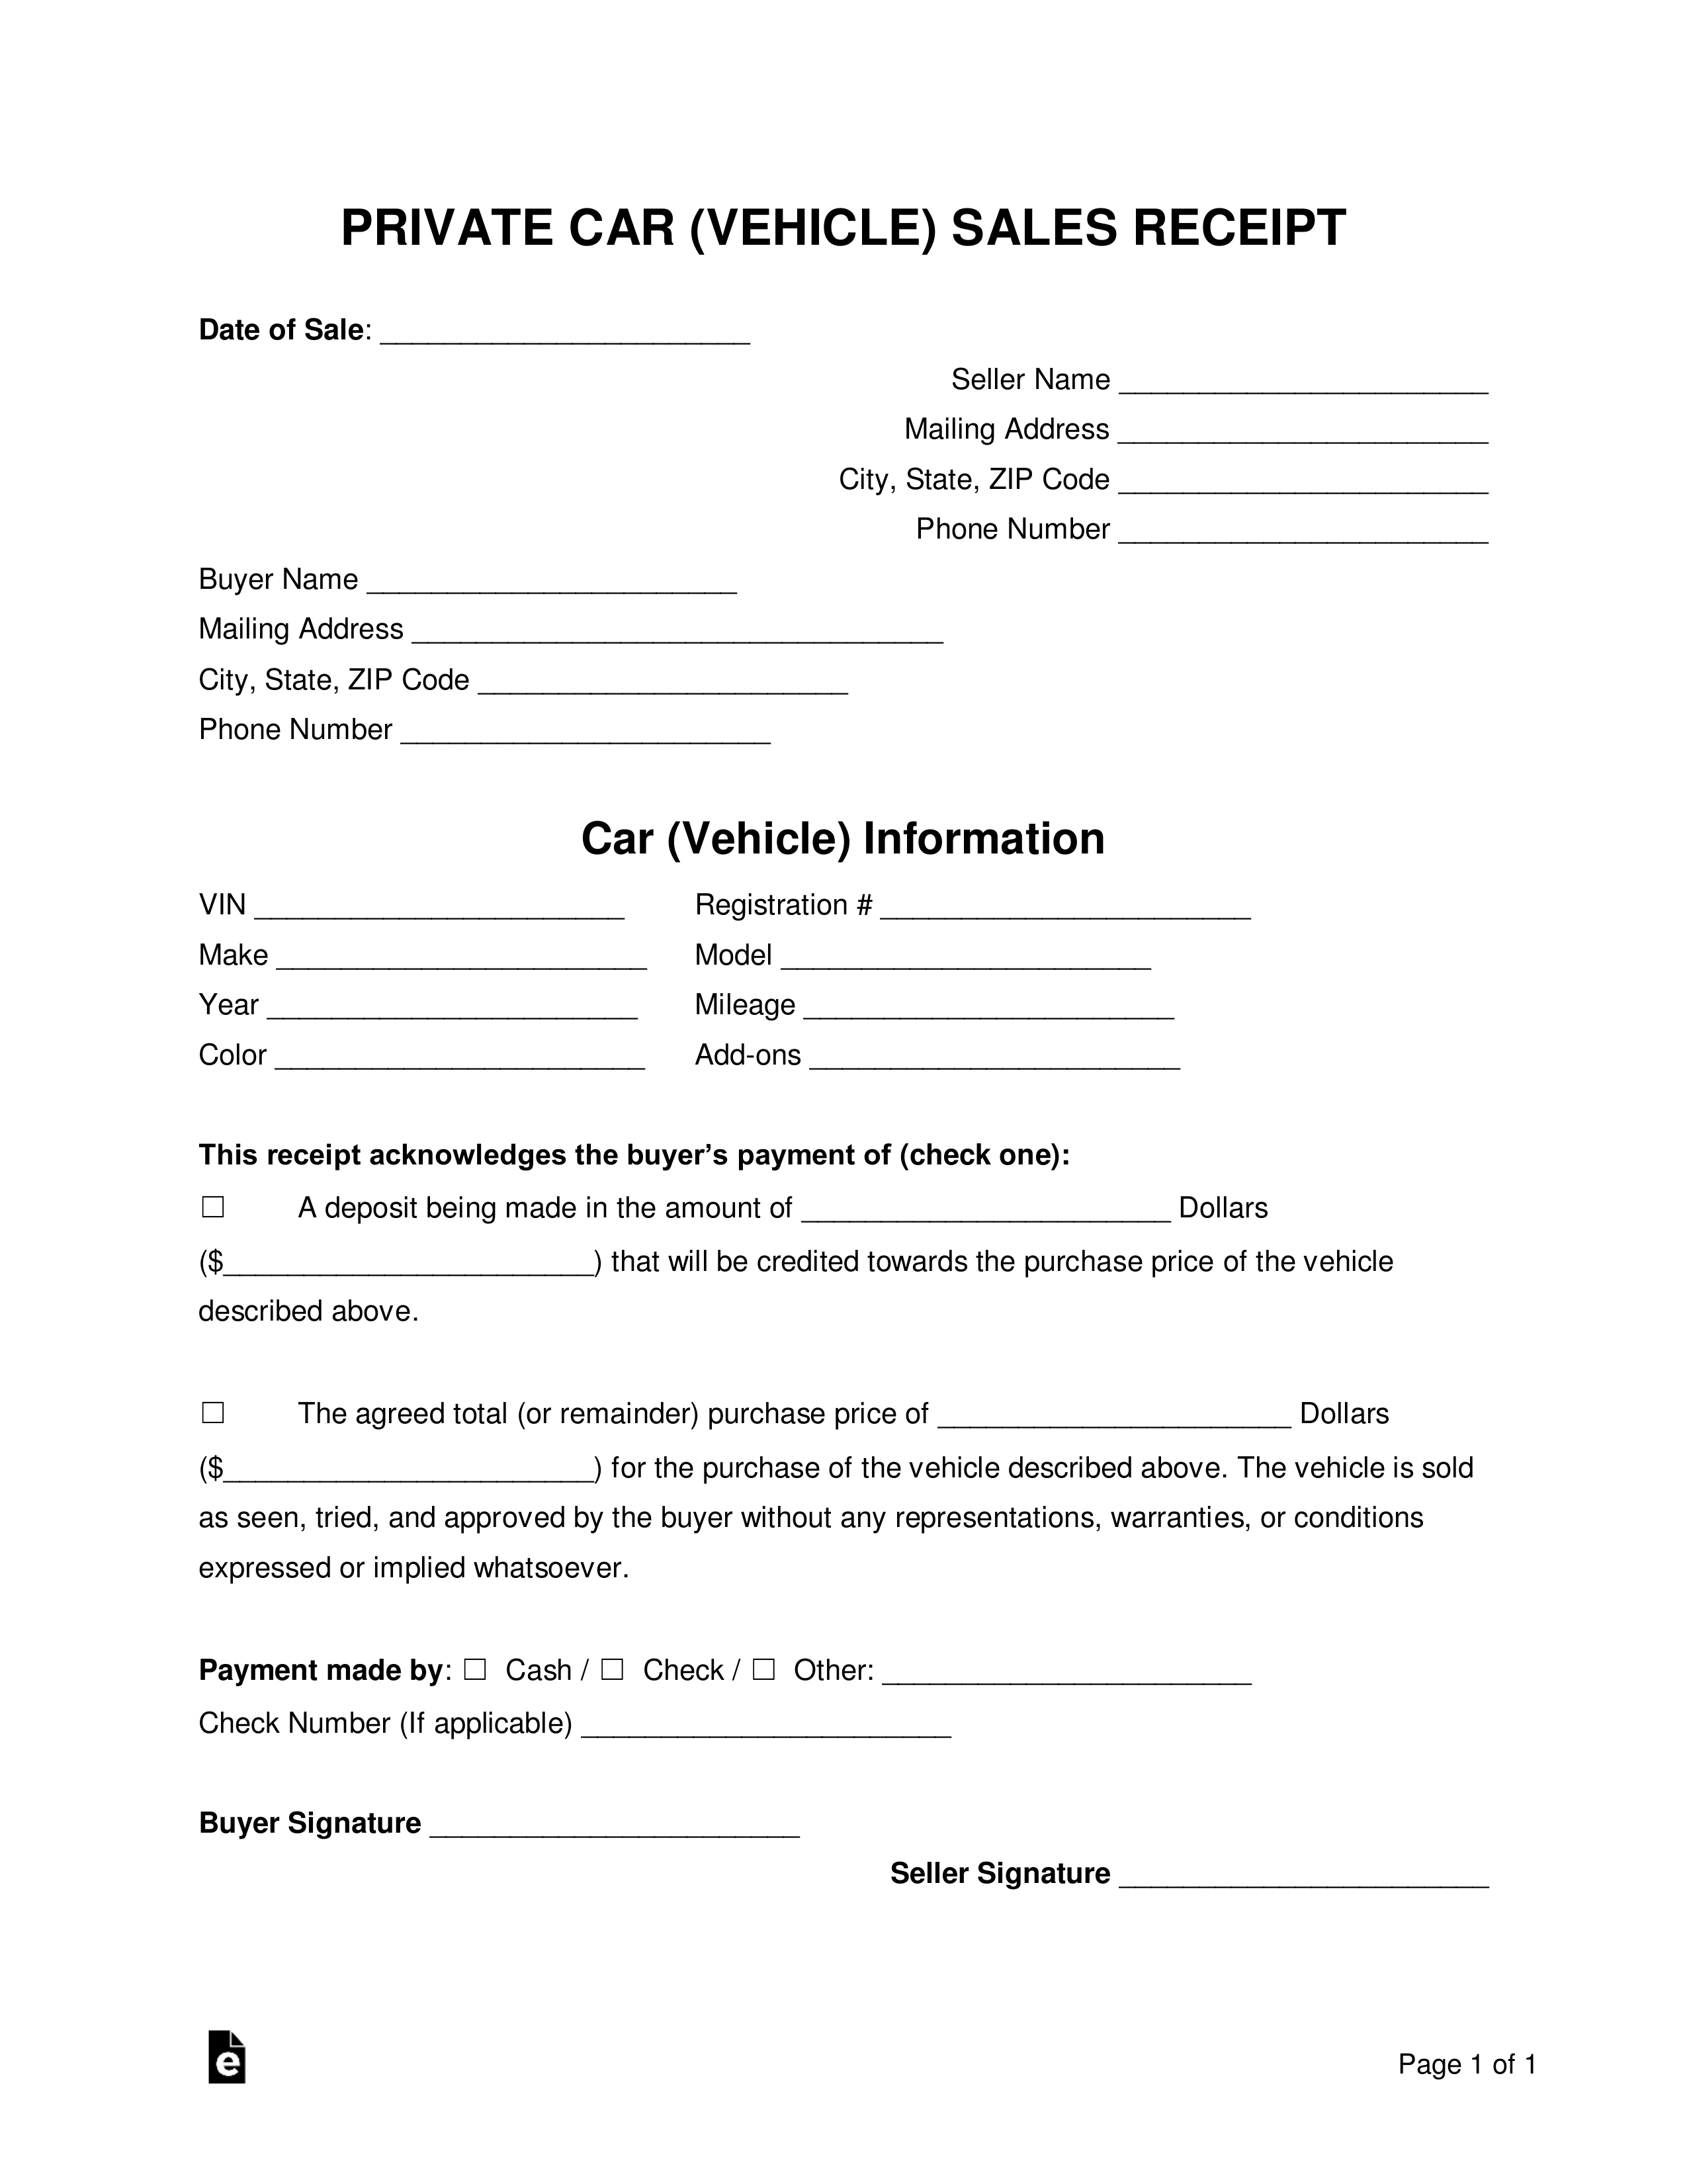 free vehicle private sale receipt template pdf word cash sale of car receipt